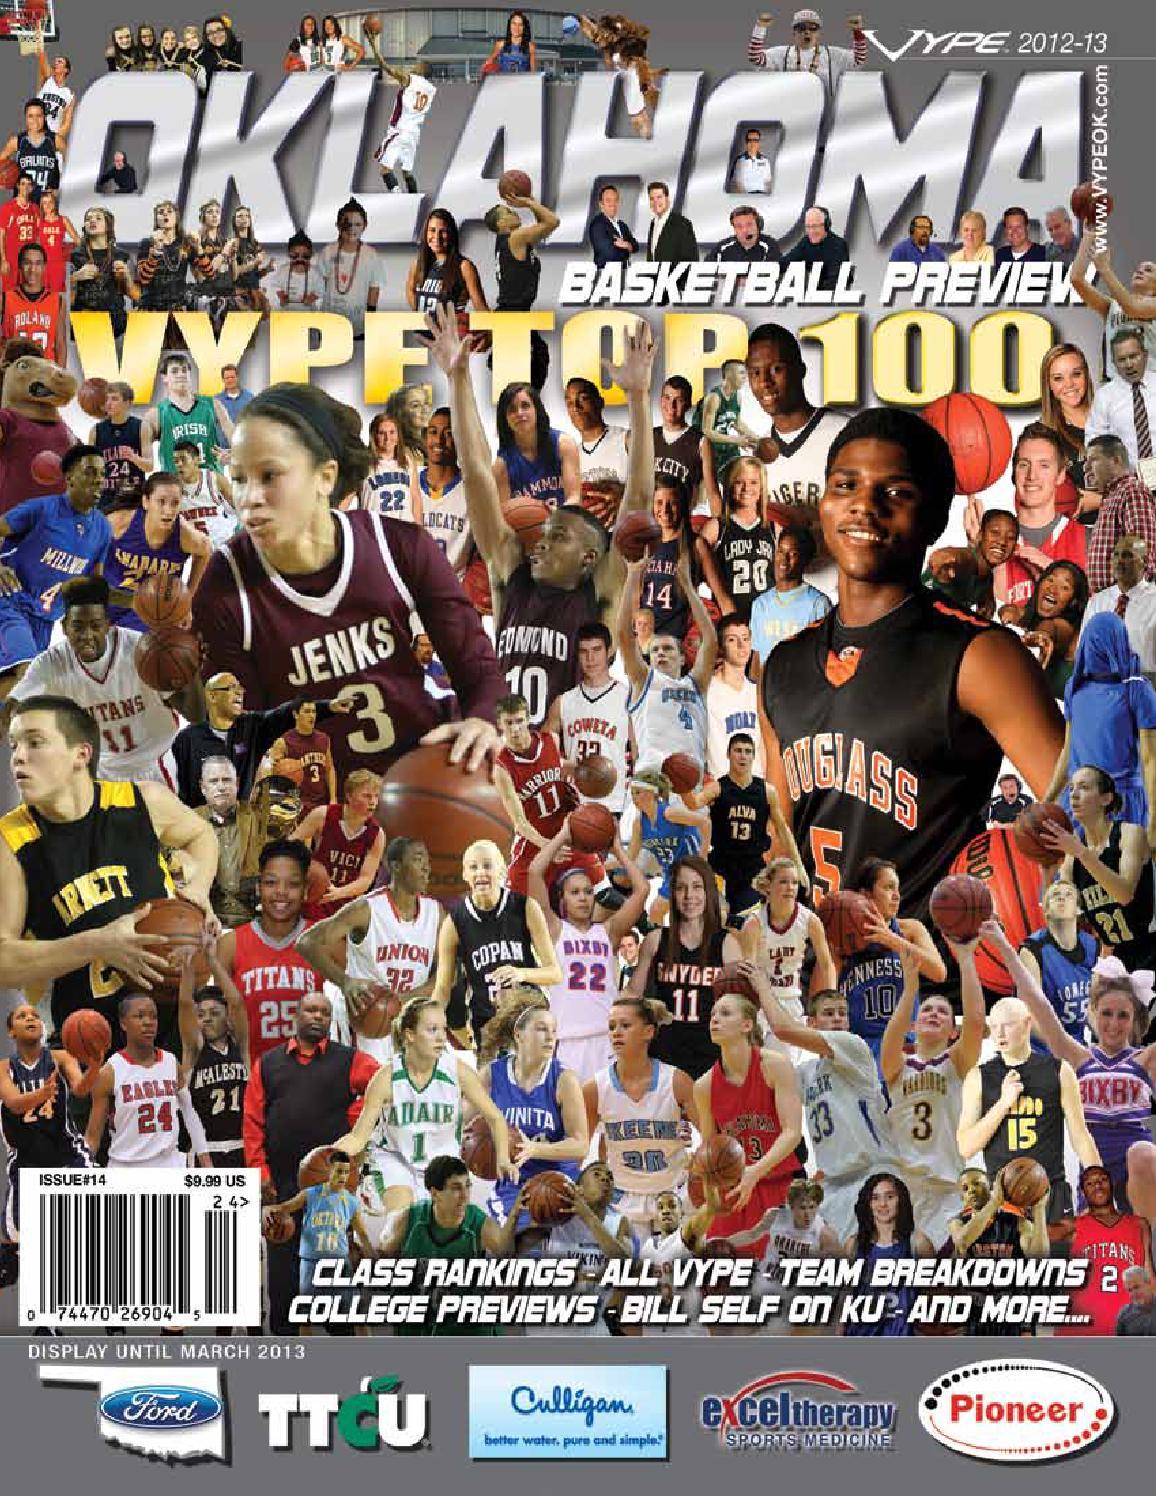 Oklahoma basketball preview 2012 by Austin Chadwick - issuu